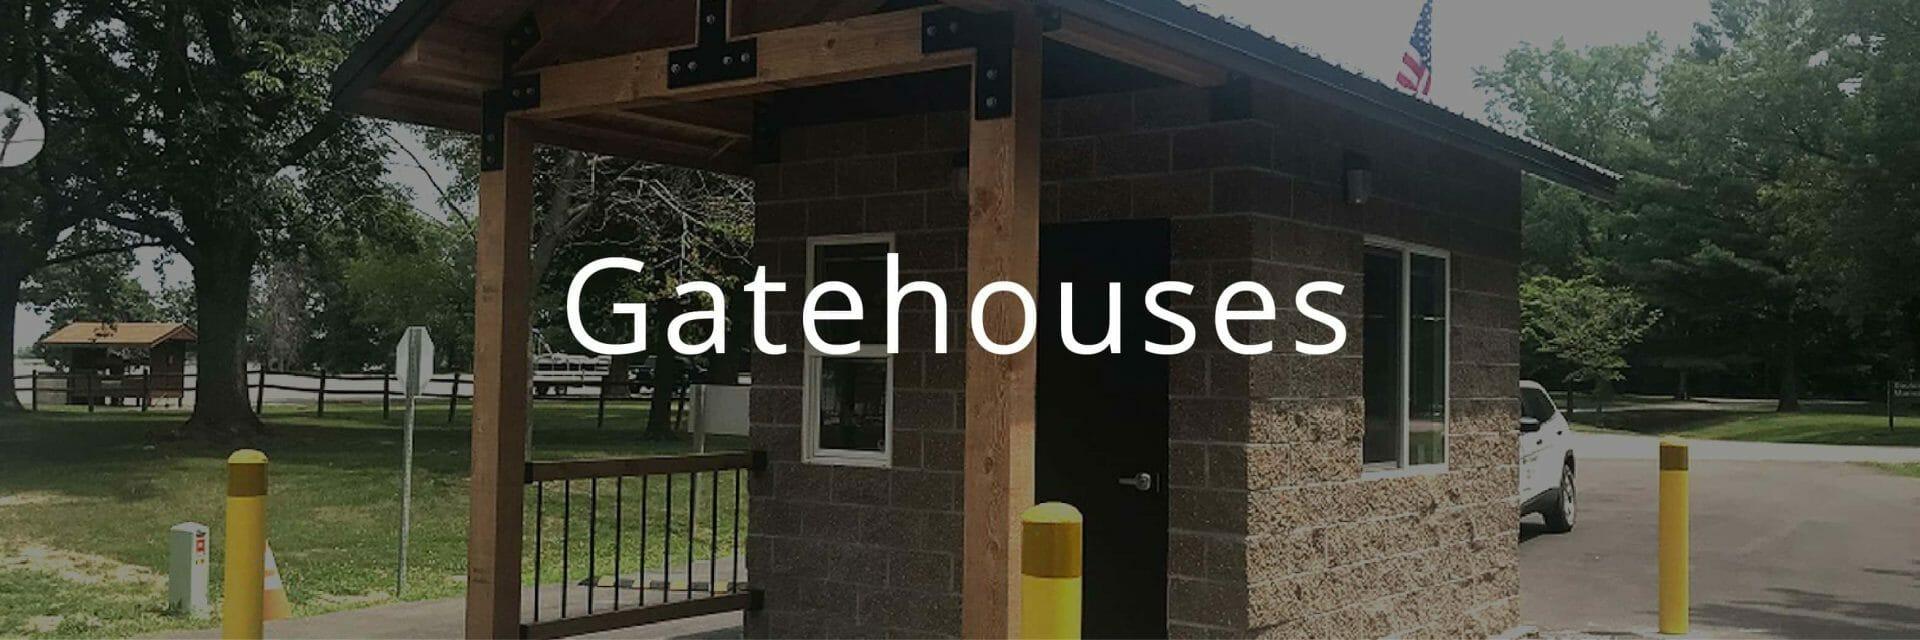 Gatehouse Security Building for Park Entrance